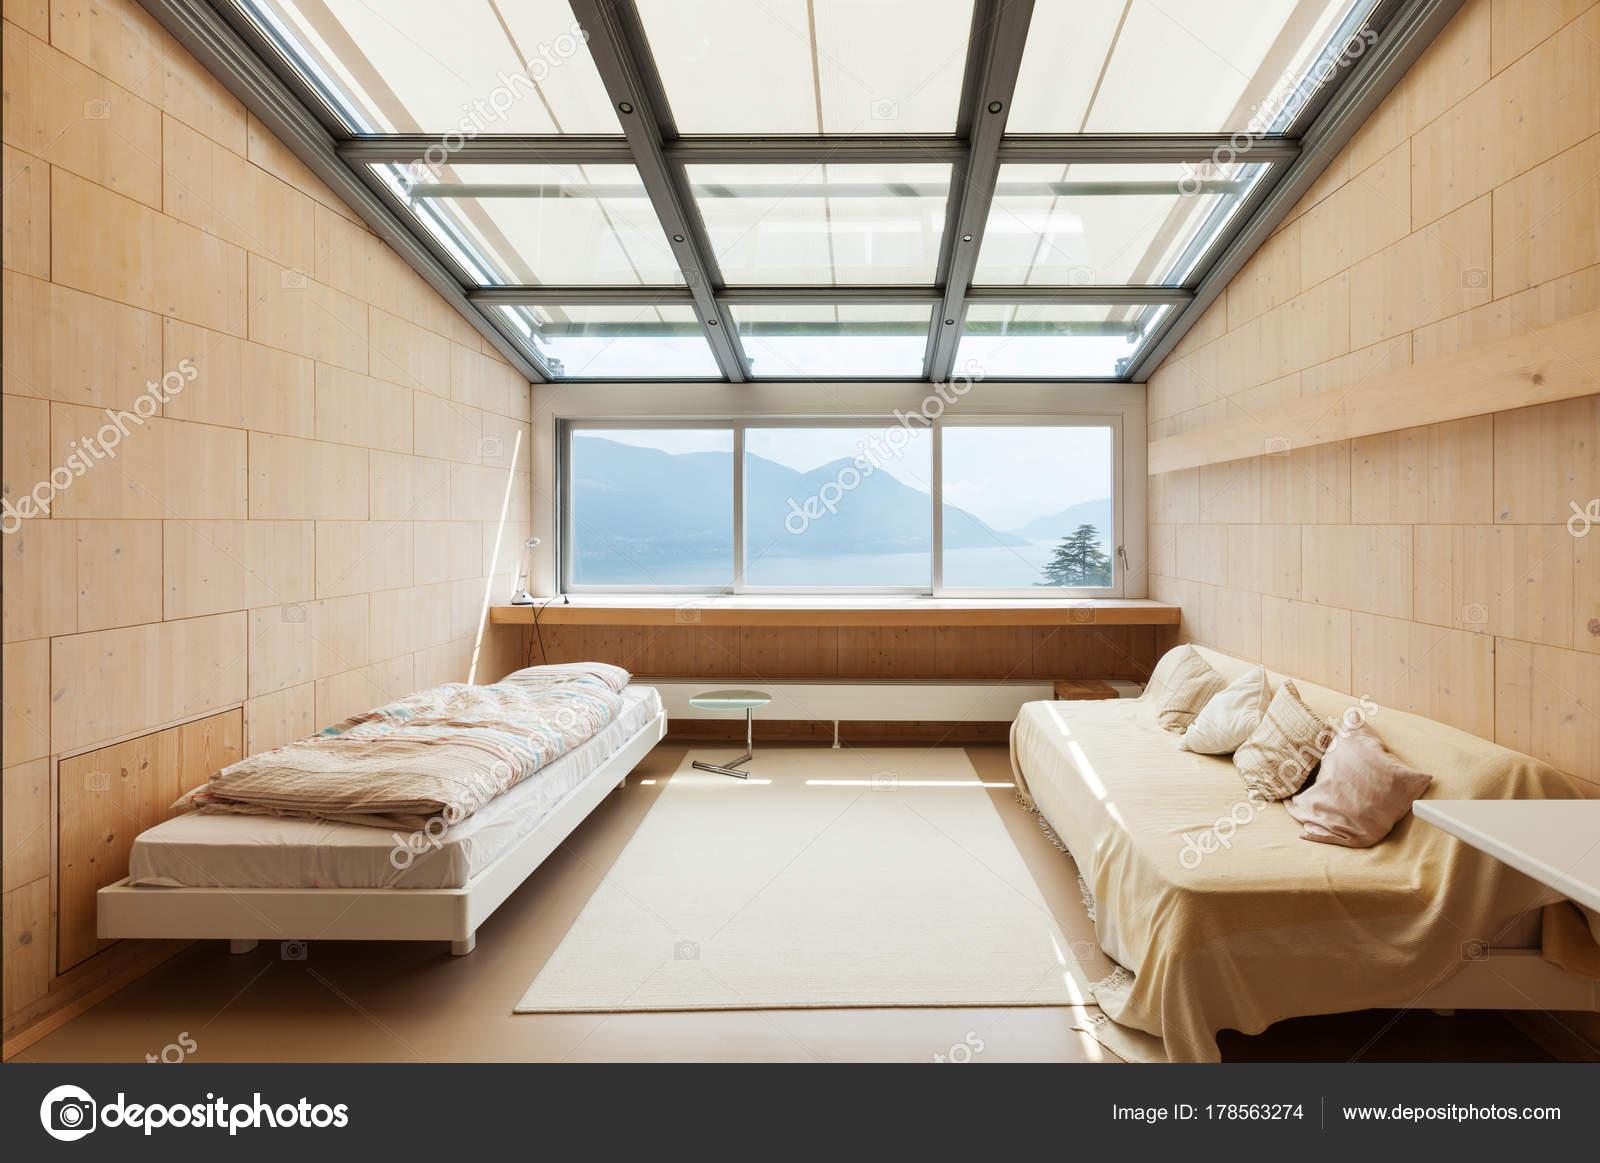 https://st3.depositphotos.com/2018053/17856/i/1600/depositphotos_178563274-stockafbeelding-moderne-architectuur-interieur-slaapkamer.jpg